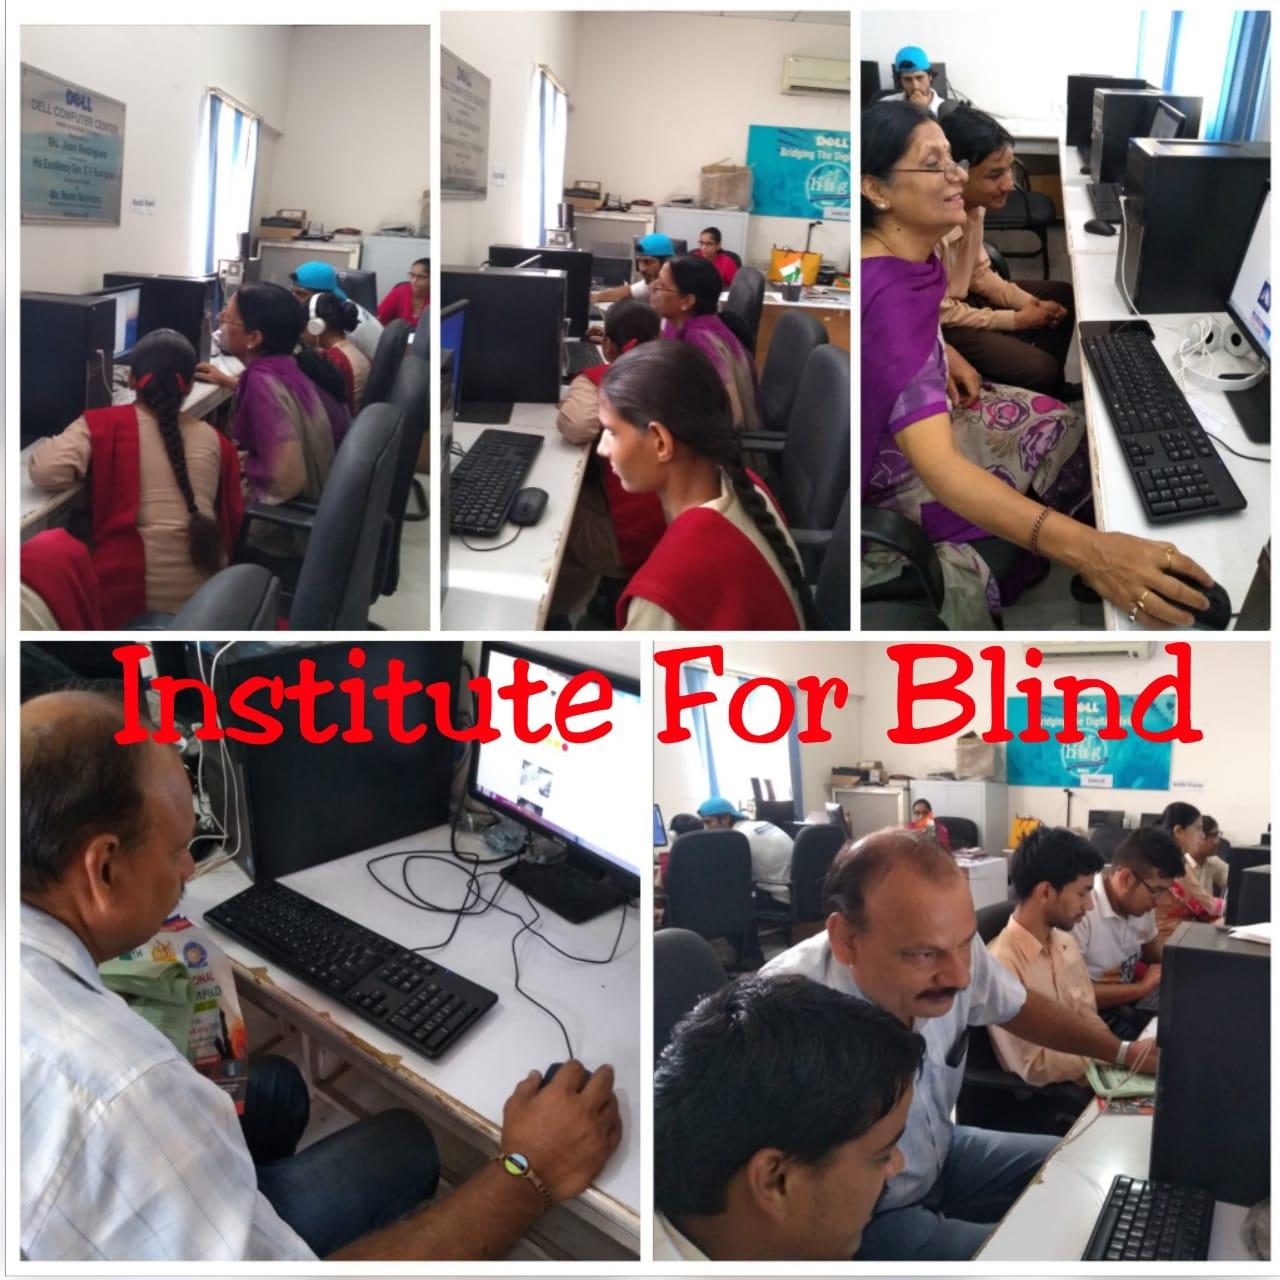 Institute For Blind.jpeg